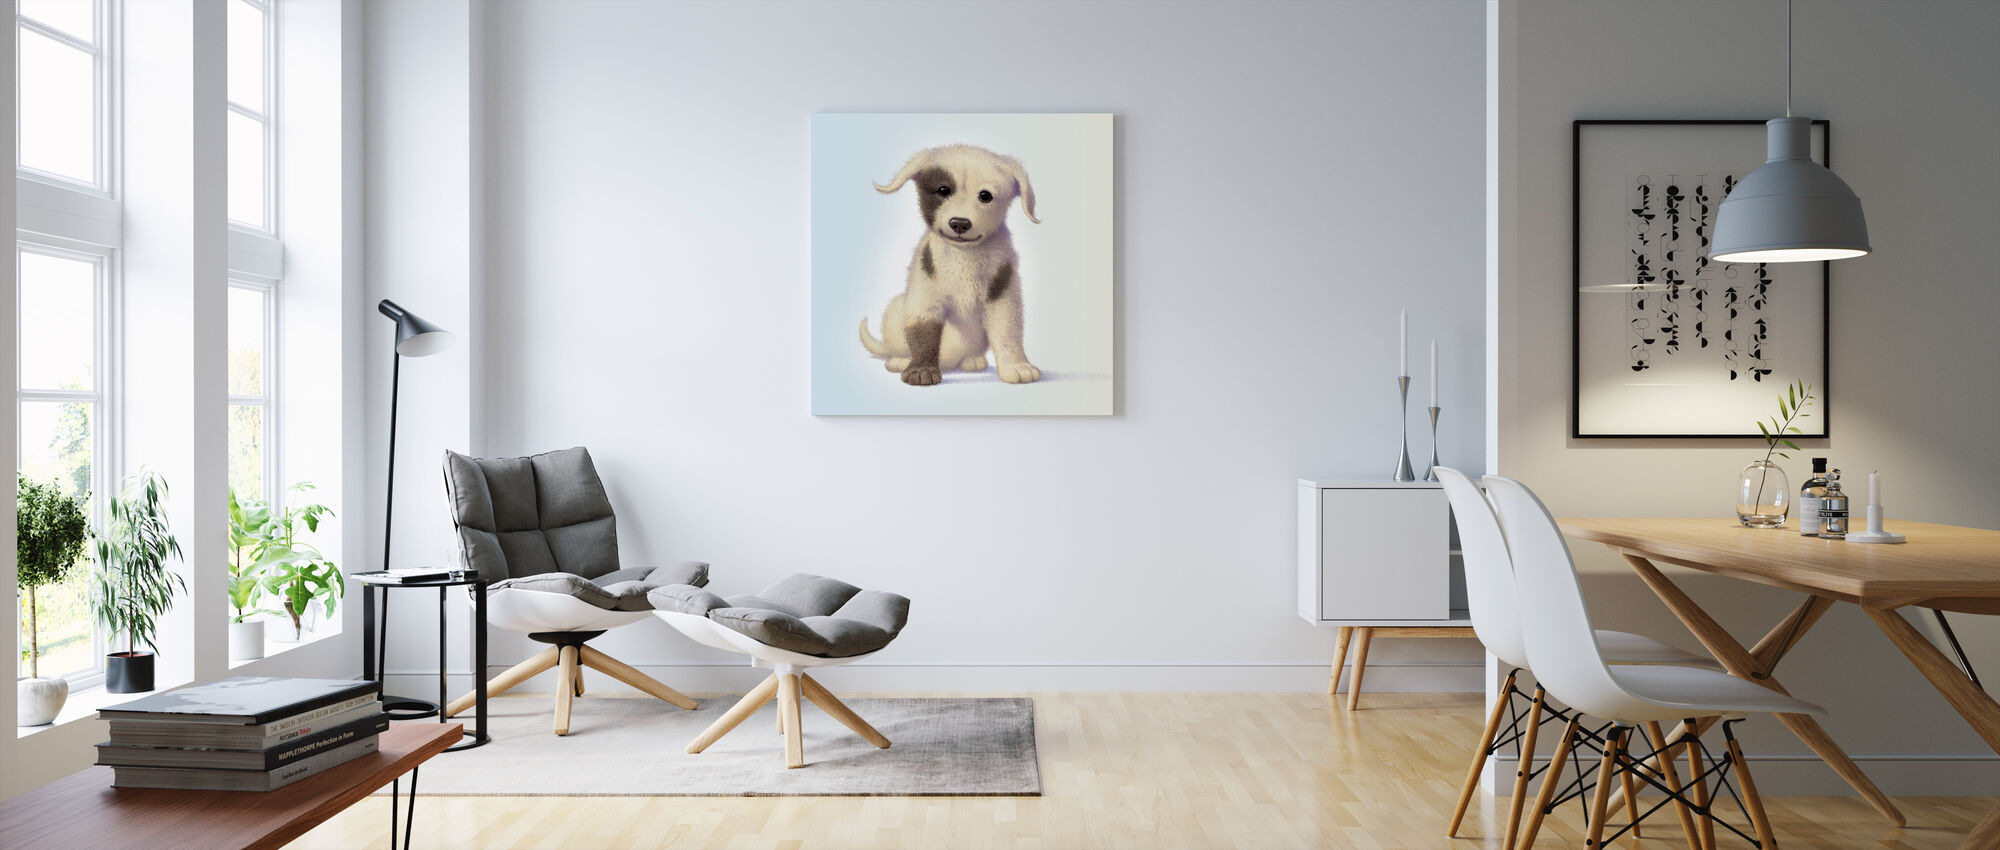 Puppy - Canvas print - Living Room